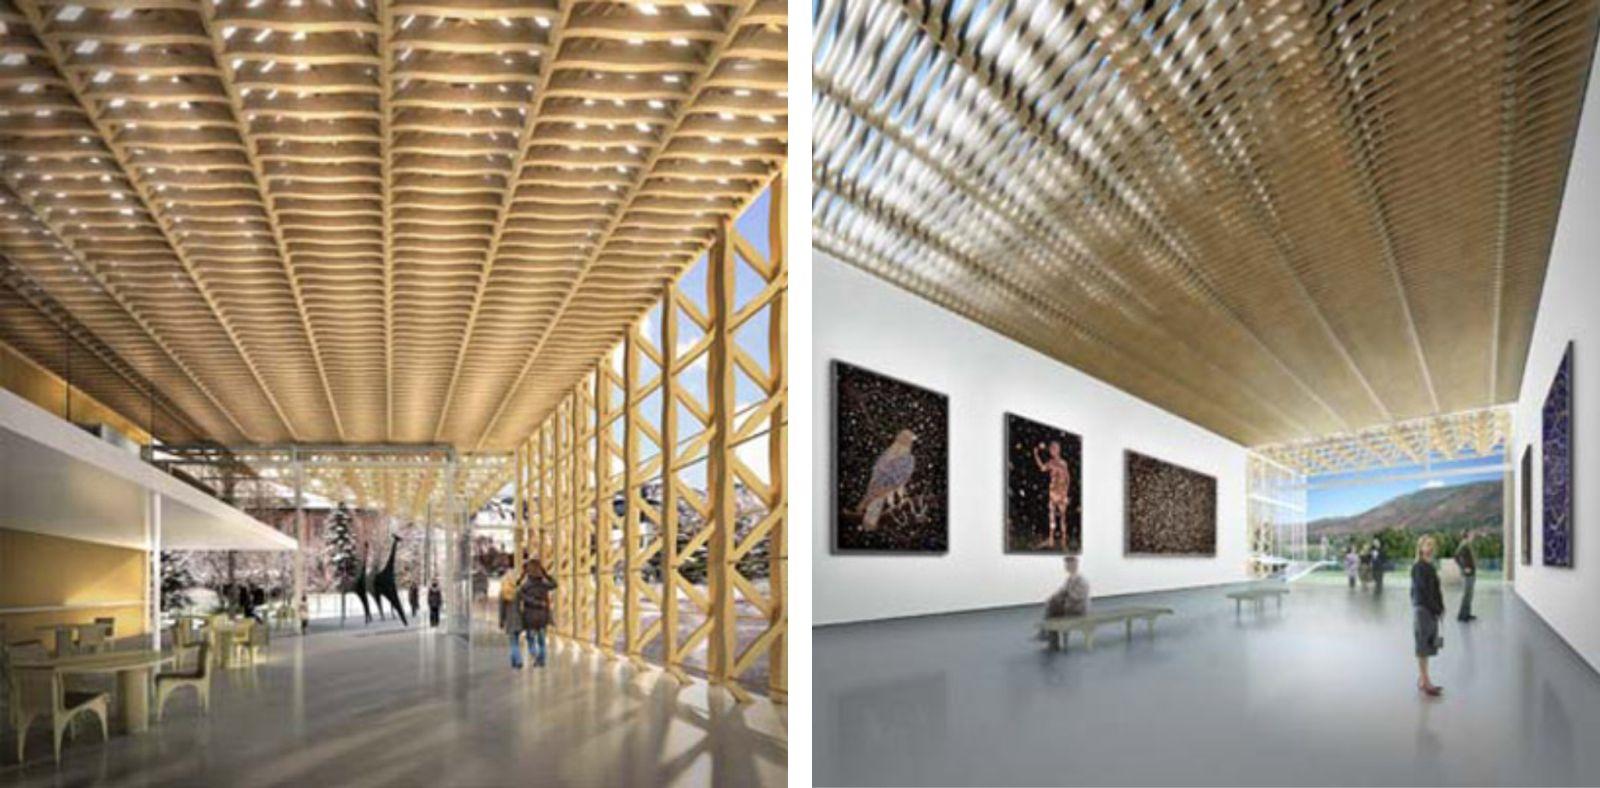 06-Aspen-Art-Museum por Shigeru Ban---junto abierto-verano